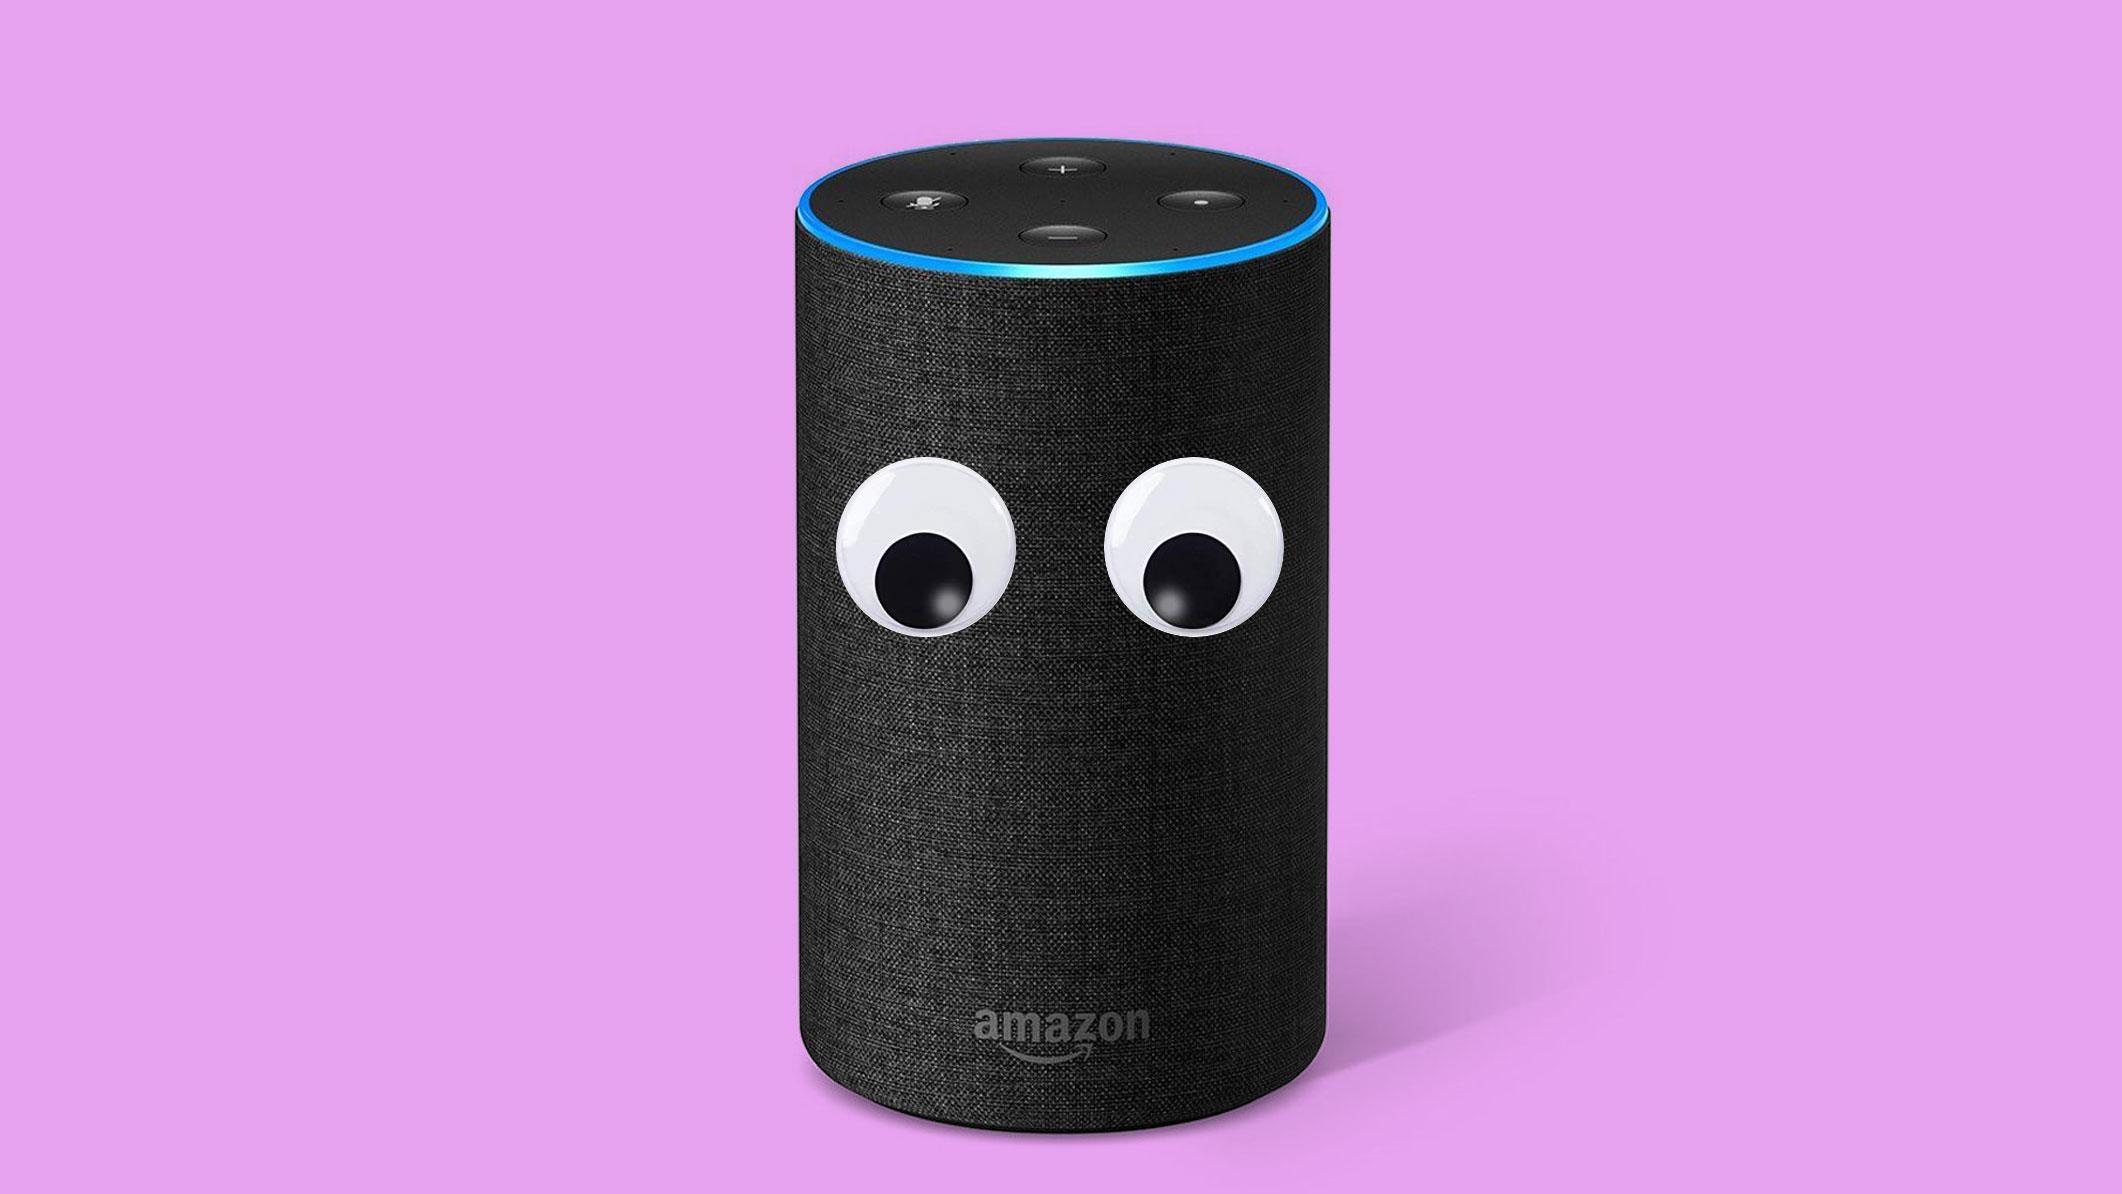 Alexa needs a robot body to escape the confines of today's AI